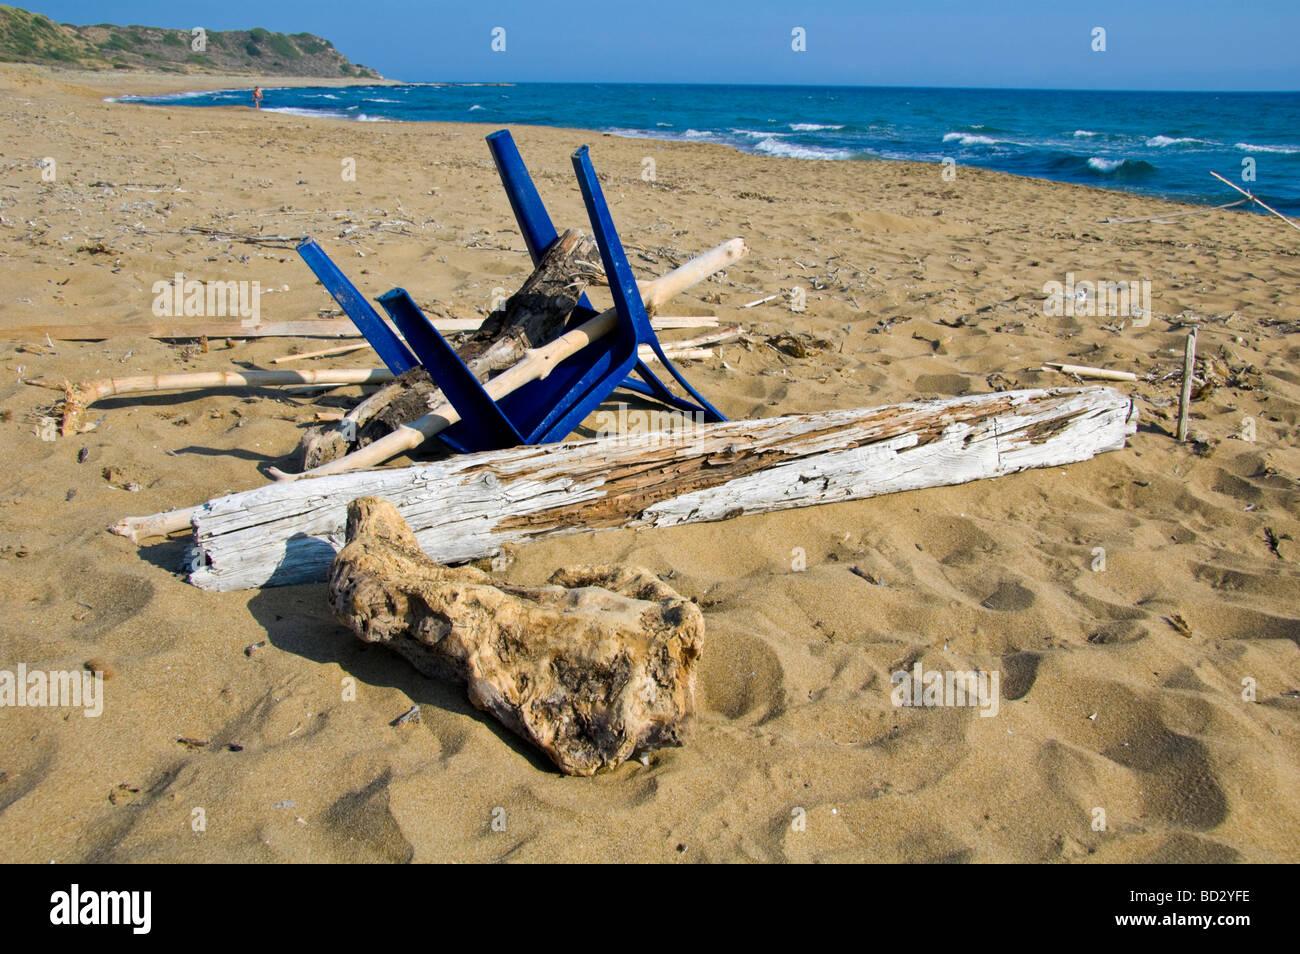 Flotsam rubbish and drift wood washed up on Mounda beach near Skala on the Greek Mediterranean island of Kefalonia - Stock Image